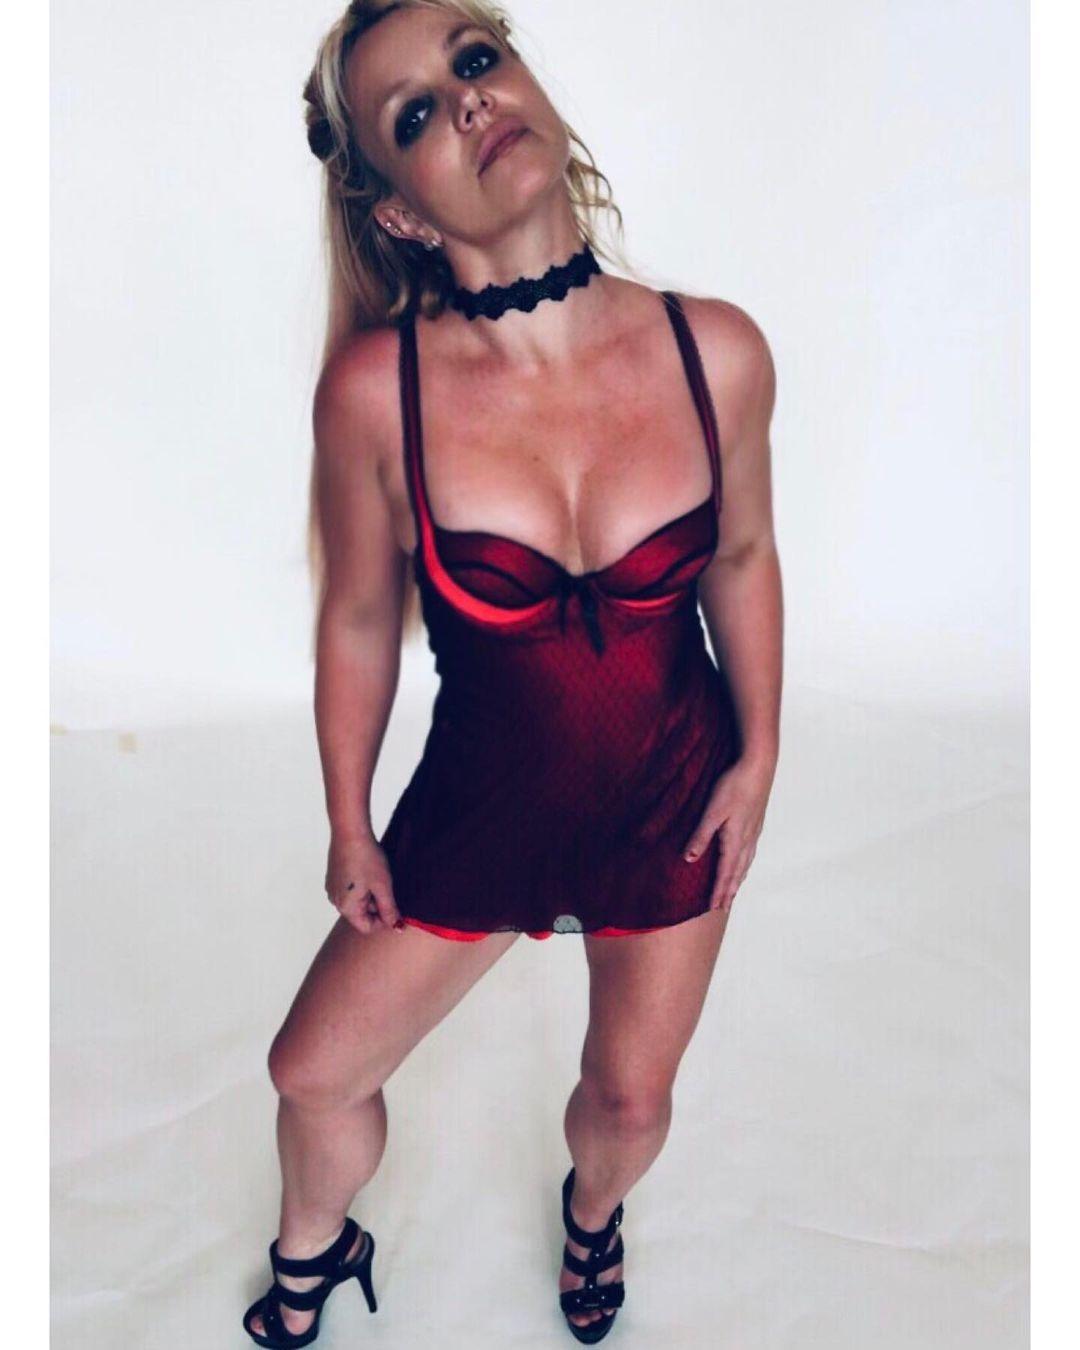 В знак протеста: Бритни Спирс оголила грудь перед камерой (ФОТО) - фото №1